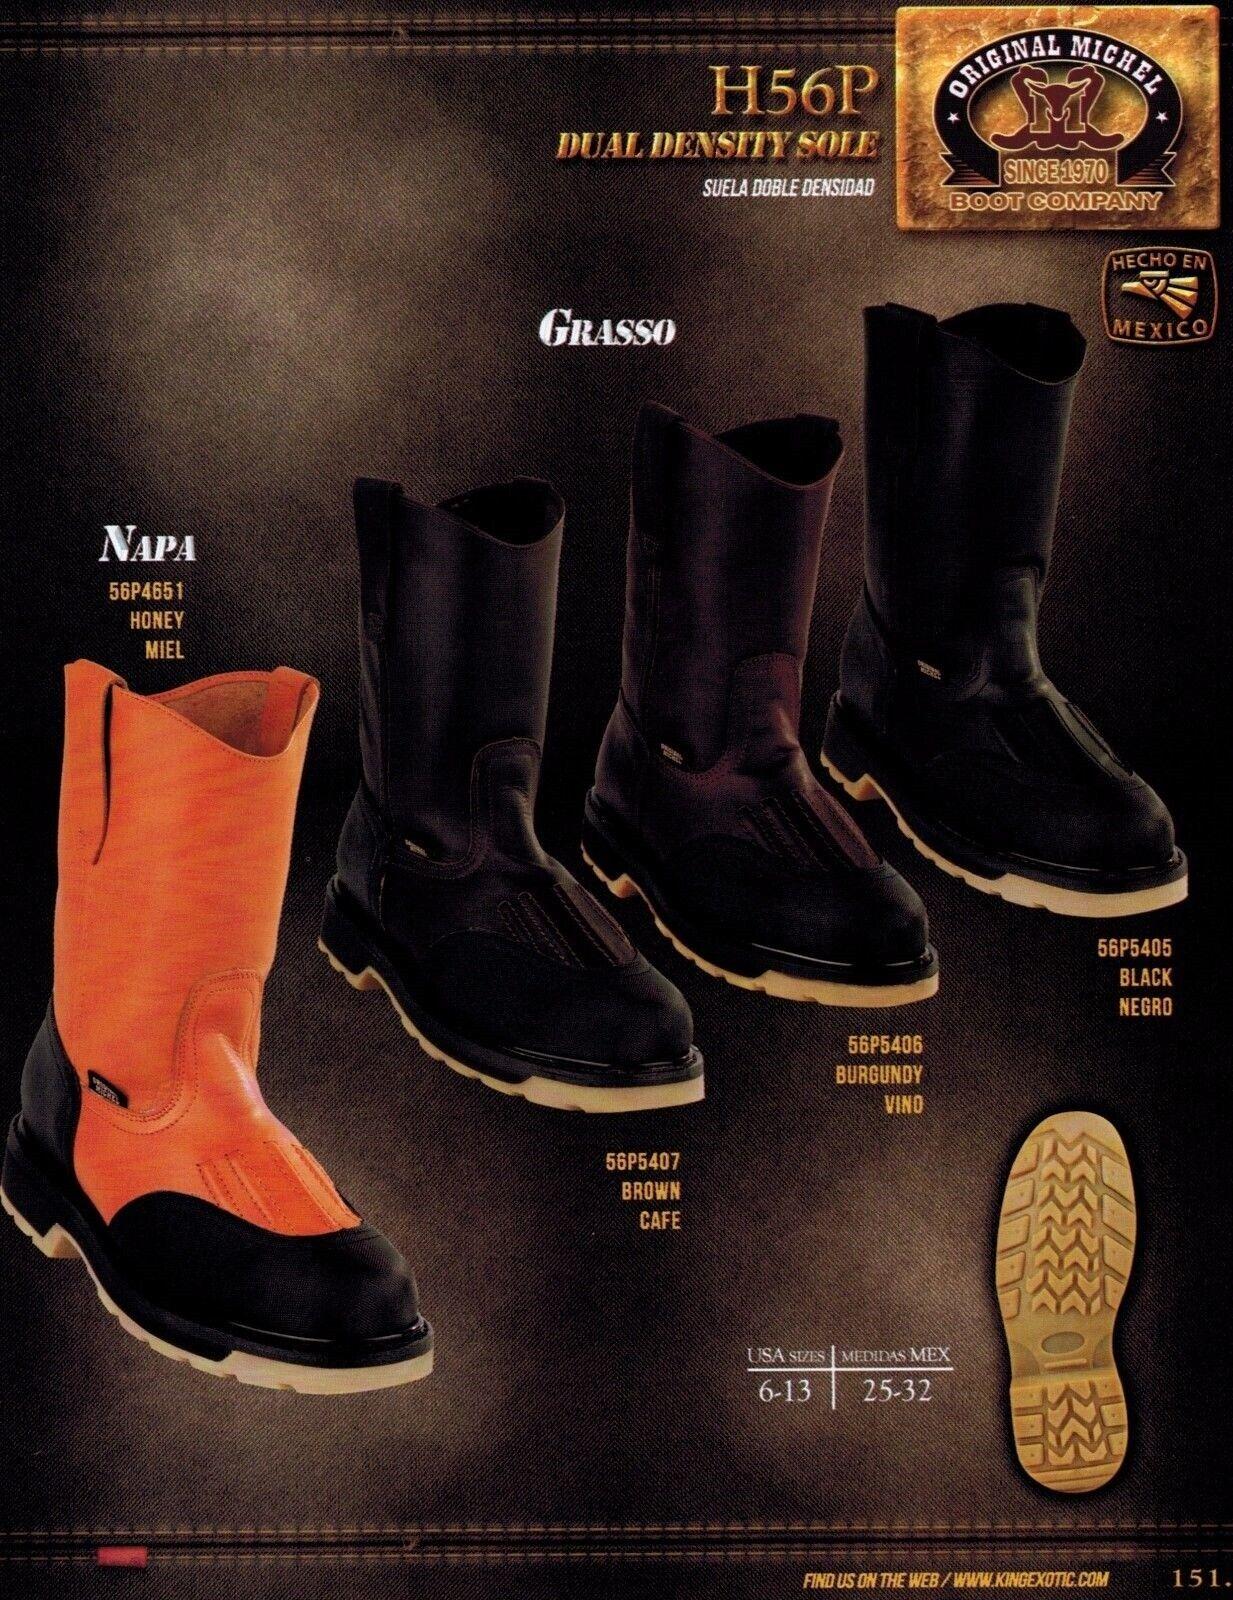 Original Michel King Exotic Men's H56P Leather Cowboy Western Work Boots